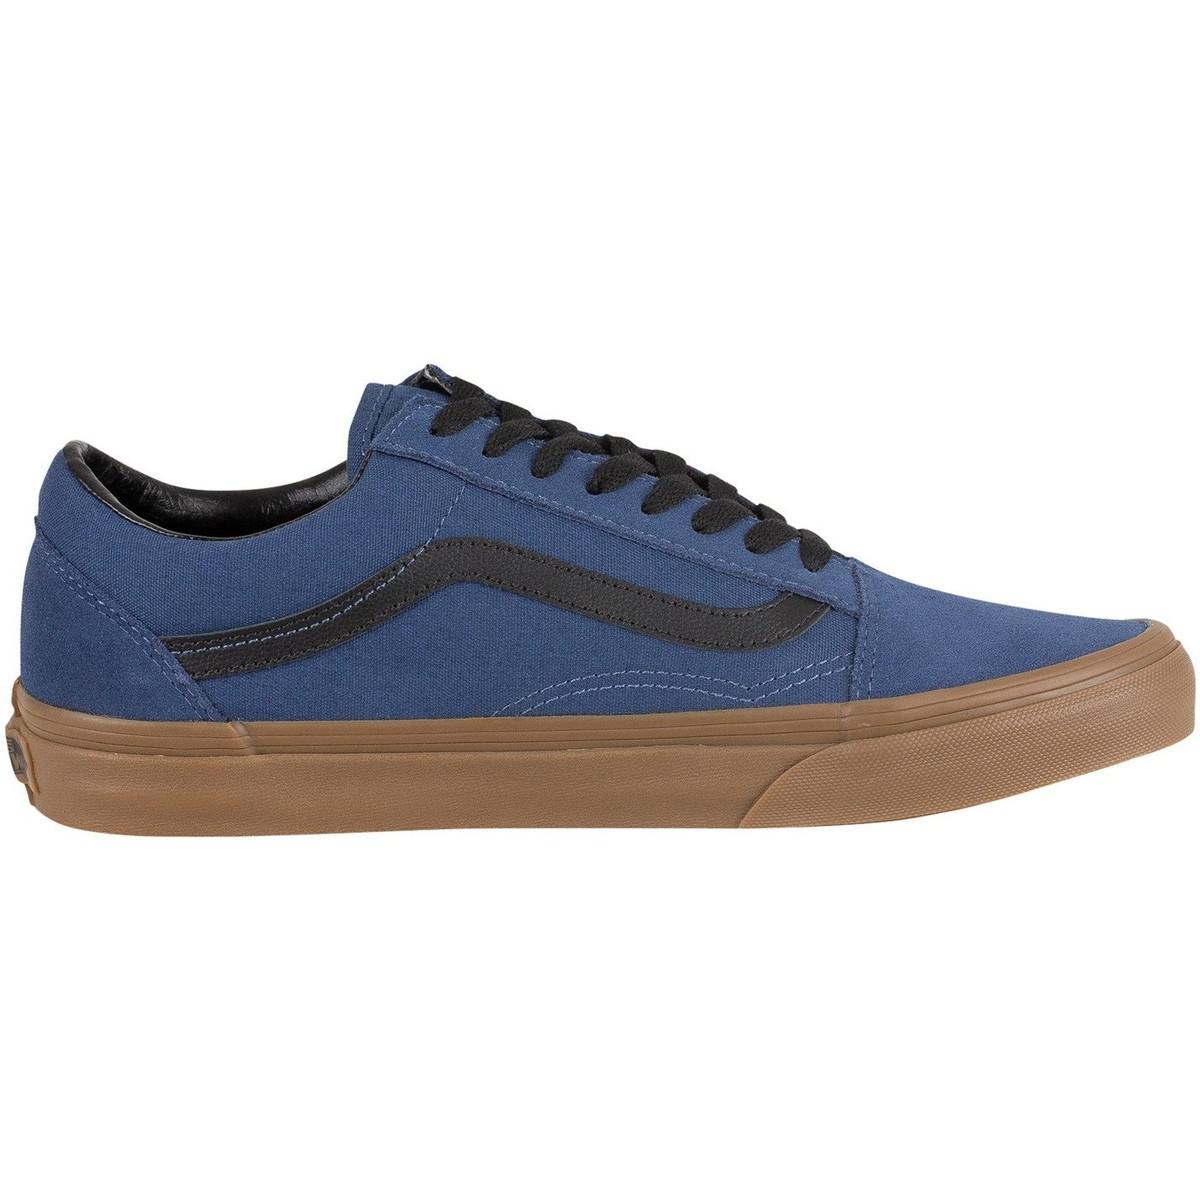 Vans Men's Old Skool Gum Outsole Trainers, Blue Men's Shoes (trainers) In Blue for Men